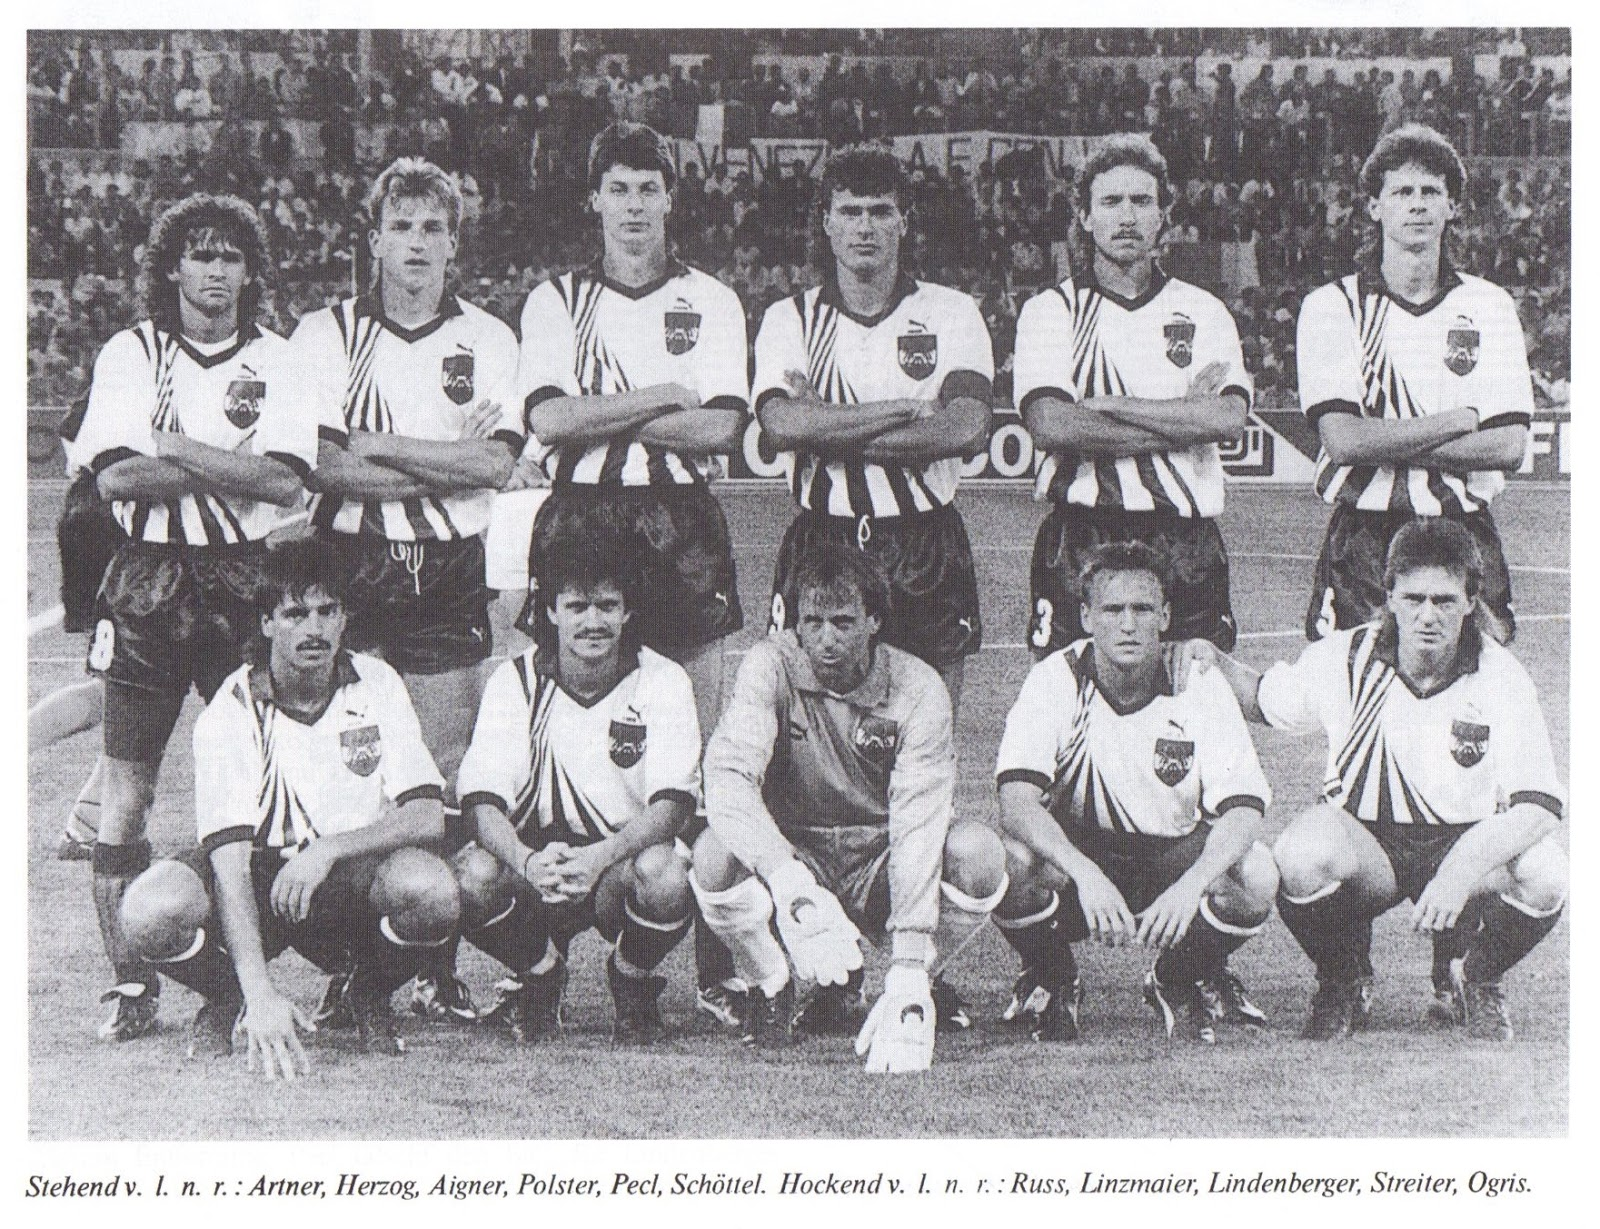 soccer nostalgia international season 1989 90, part 12  fu%c3%83%c2%9fball sweatshirts c 7 #7